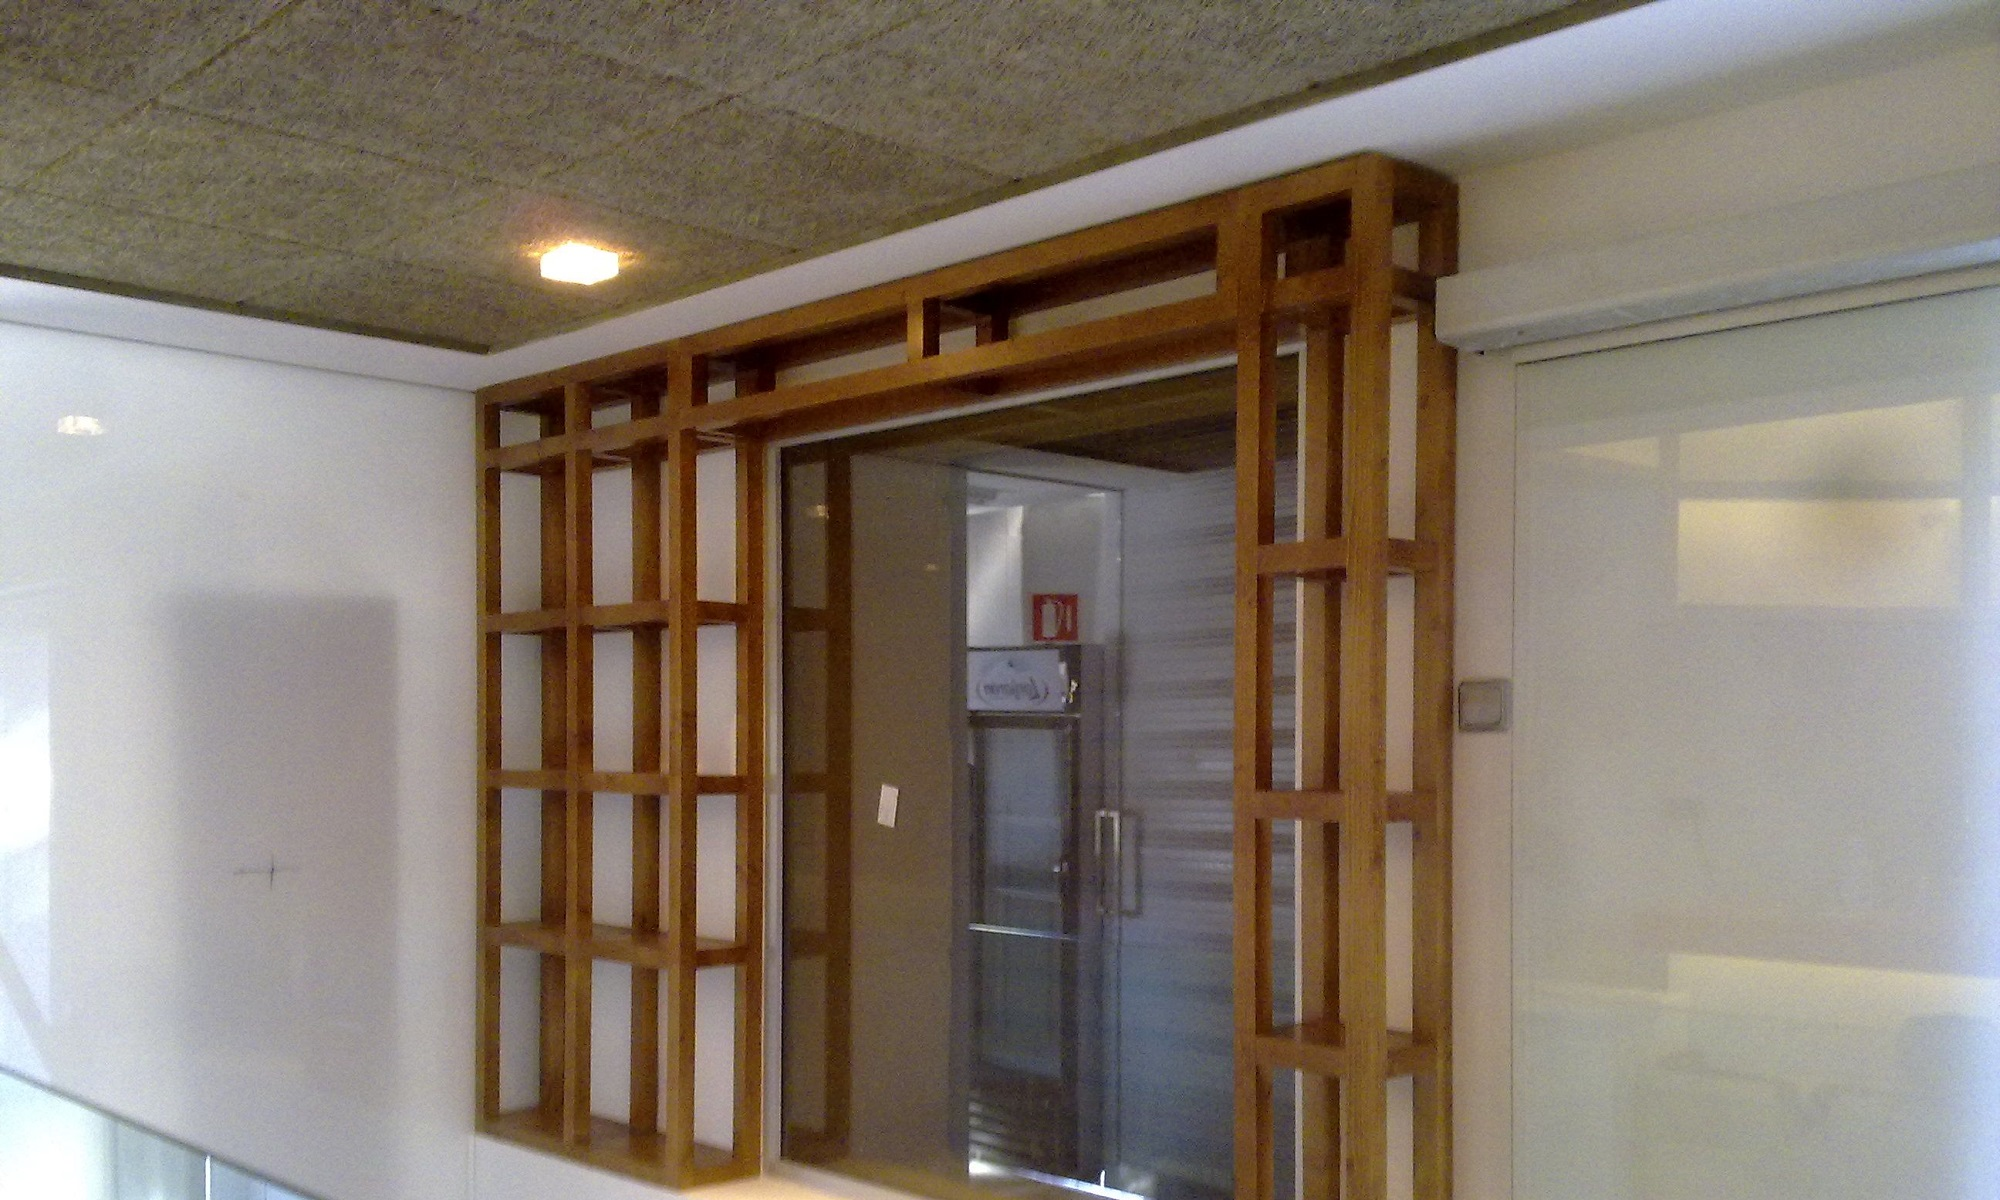 Muebles A Medida Carpinteria Torrent Valencia Amdecoracion # Muebles Cullera